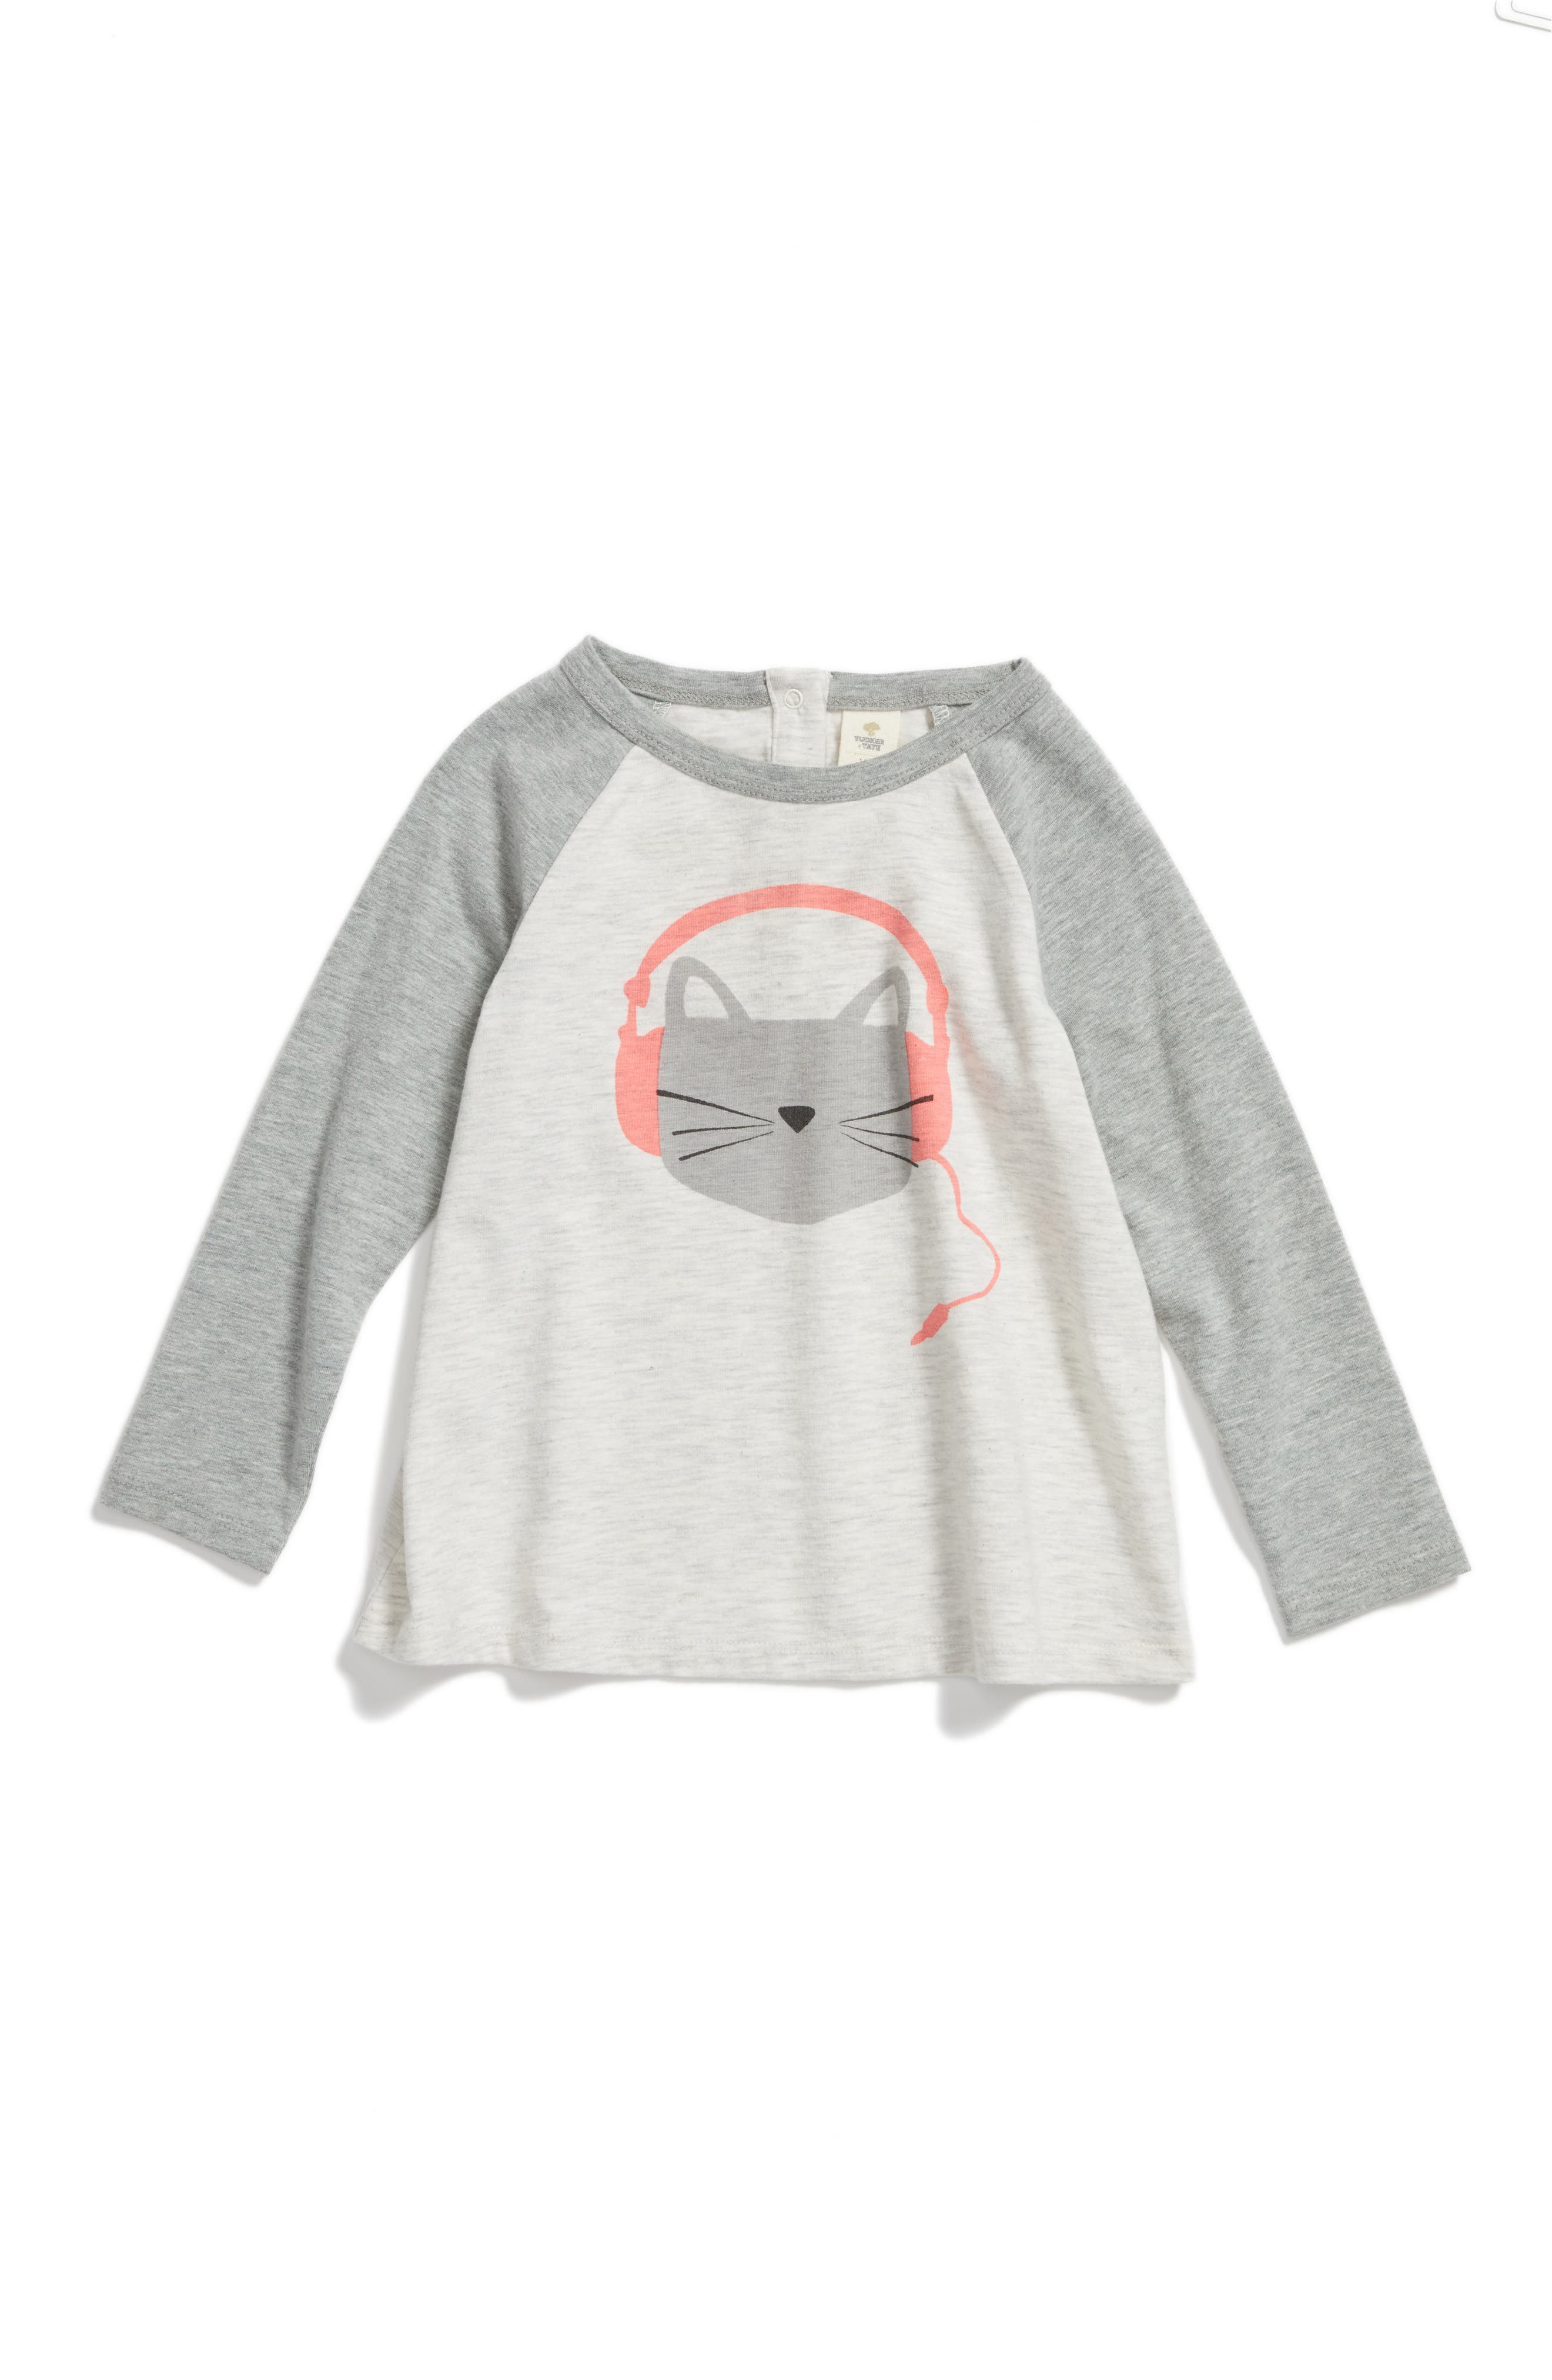 Alternate Image 1 Selected - Tucker + Tate Cat Graphic Tee (Baby Girls)